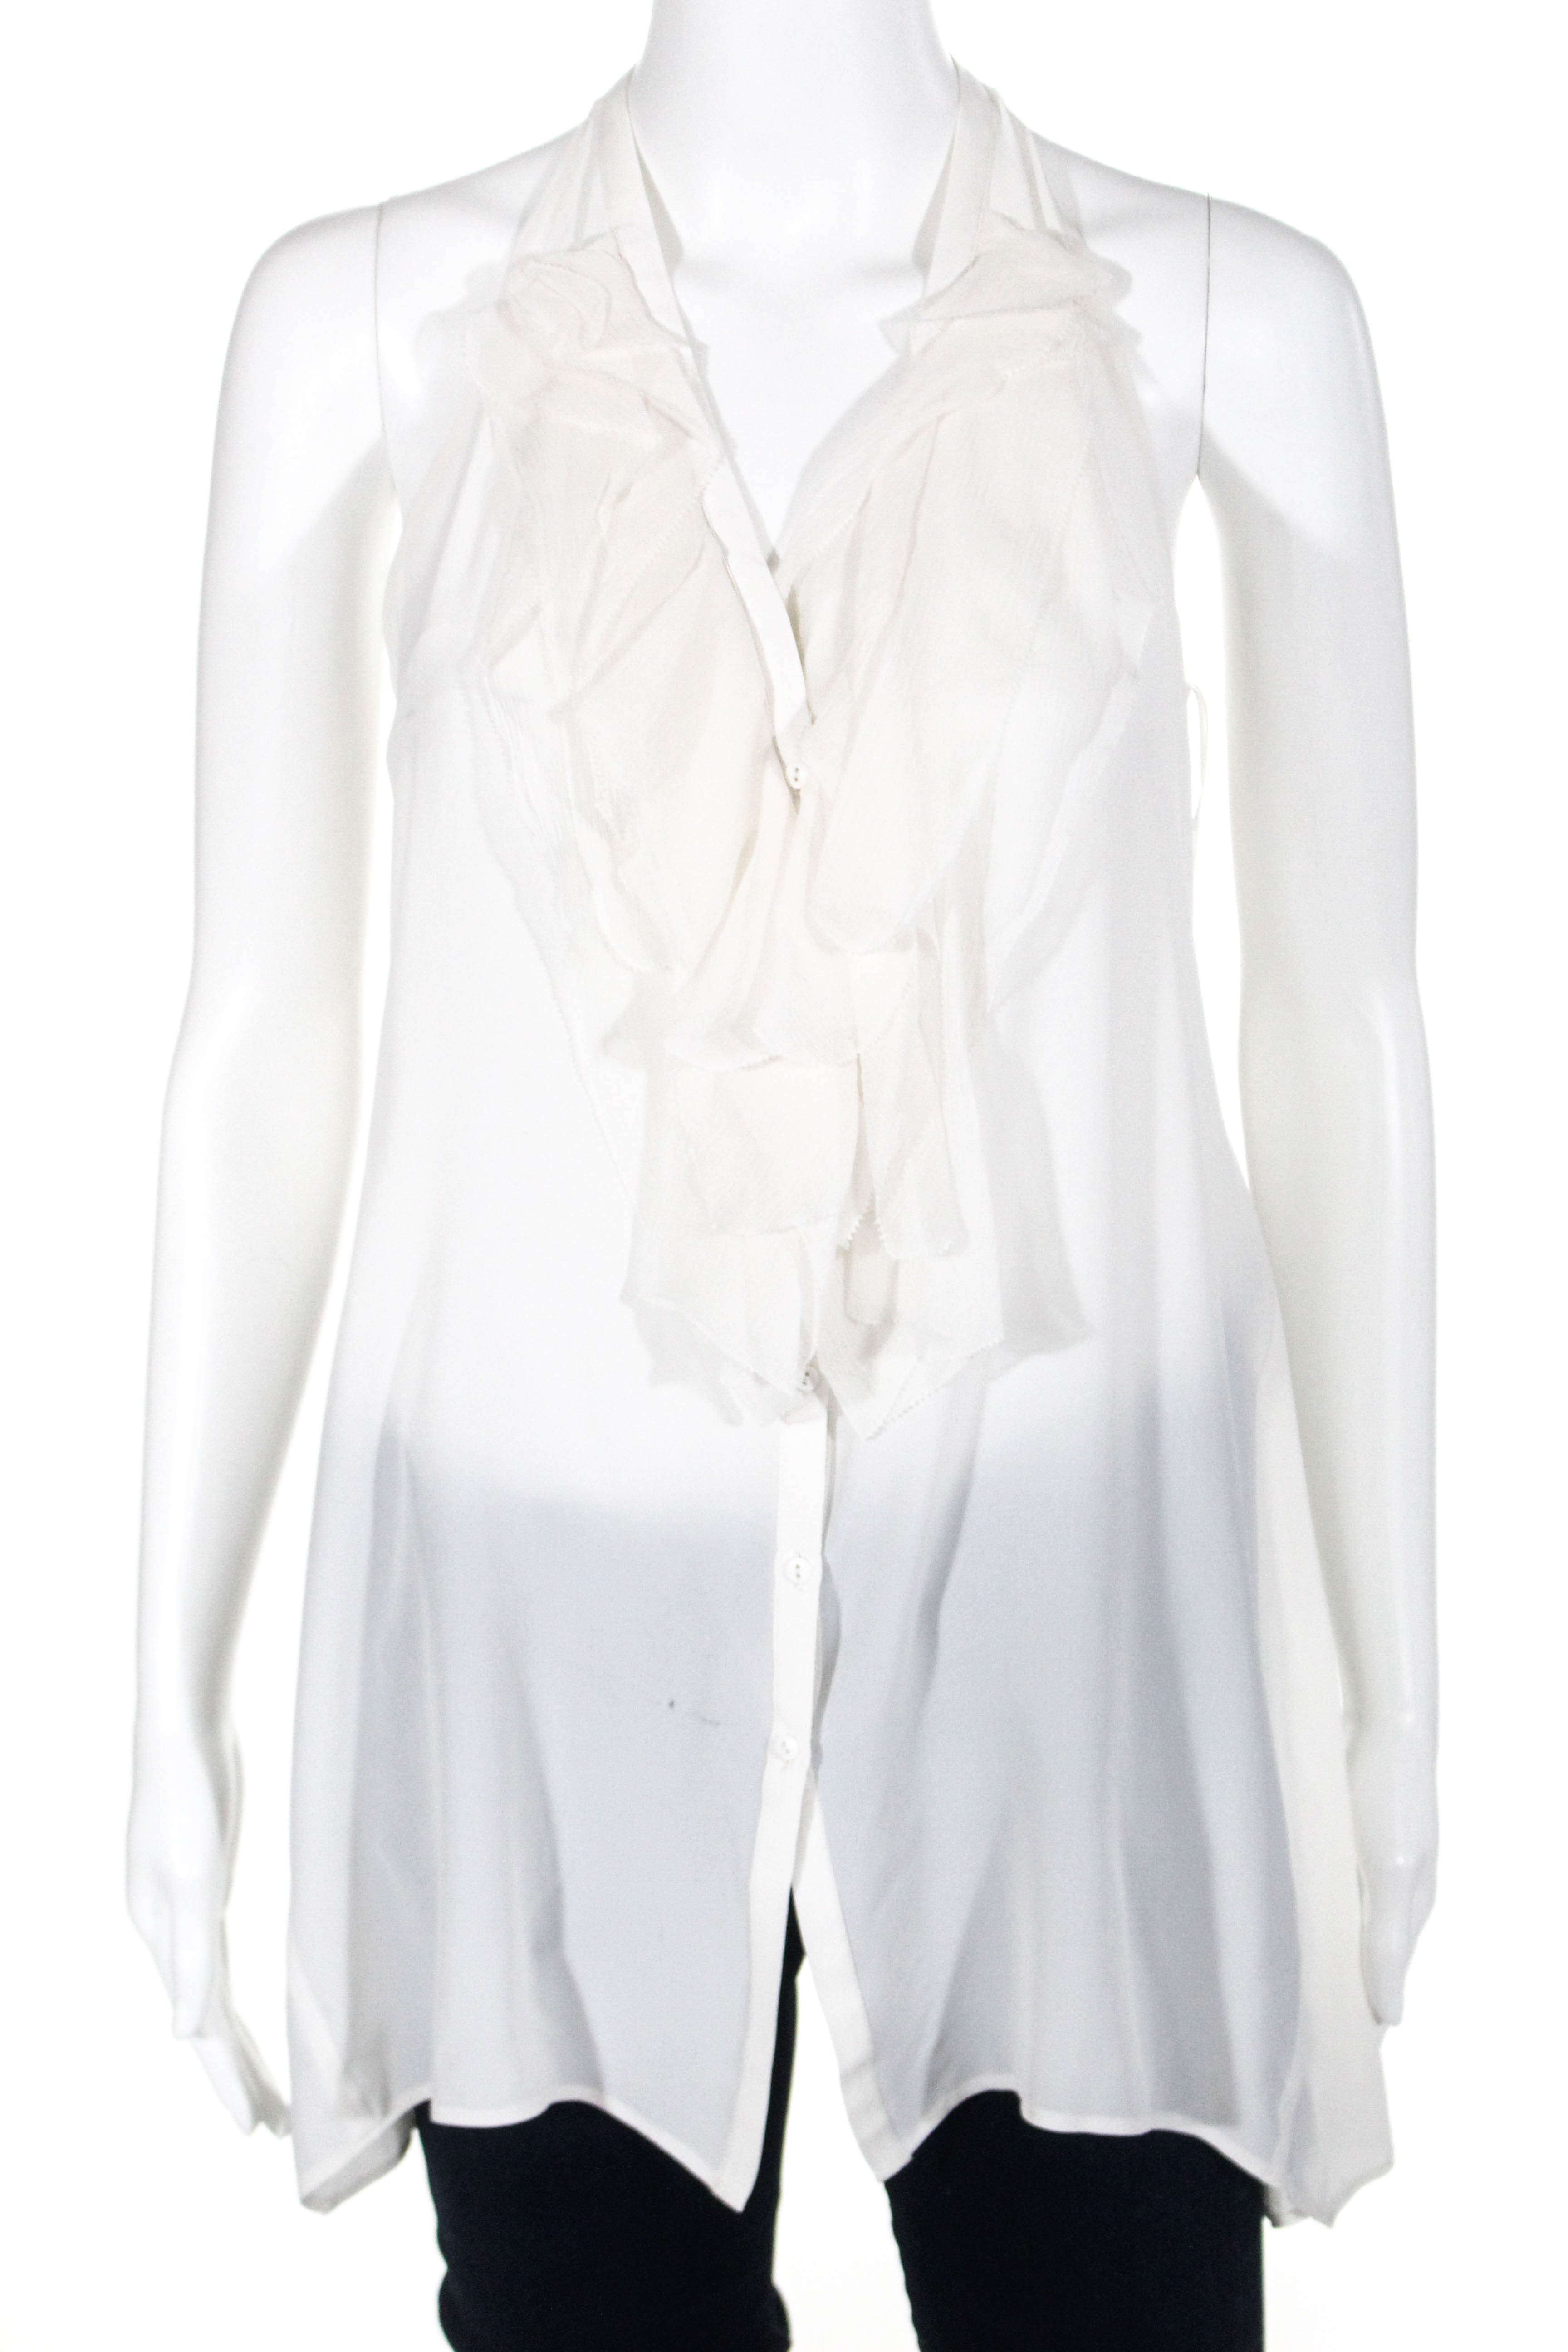 aef5041c96bb02 Vince Womens Sleeveless Button Down Ruffle Blouse Top Beige White Silk Size  XS